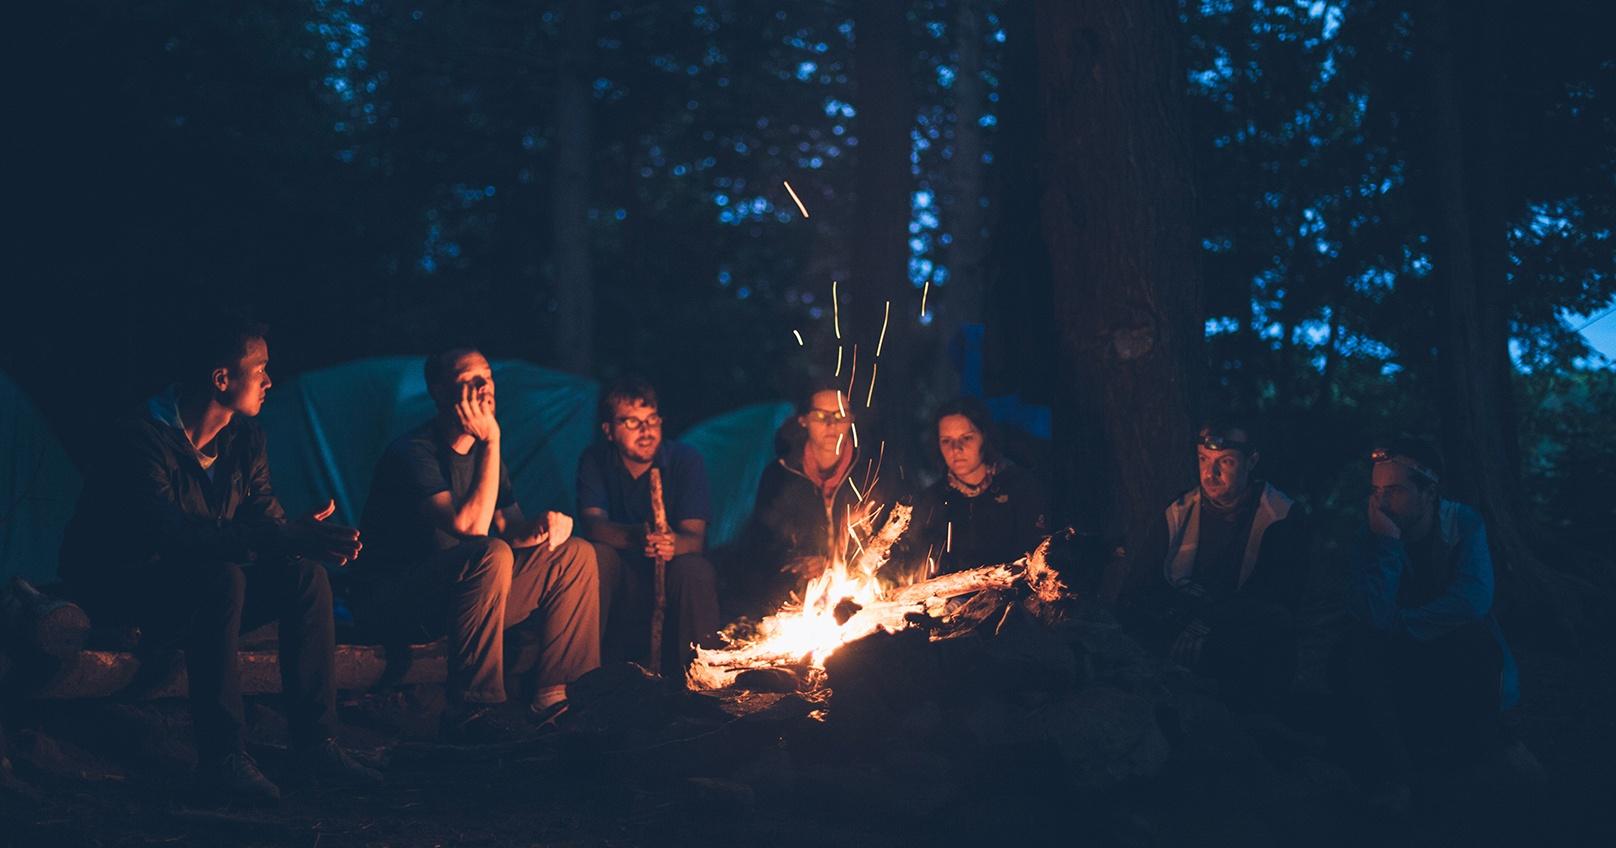 blog image - campfire